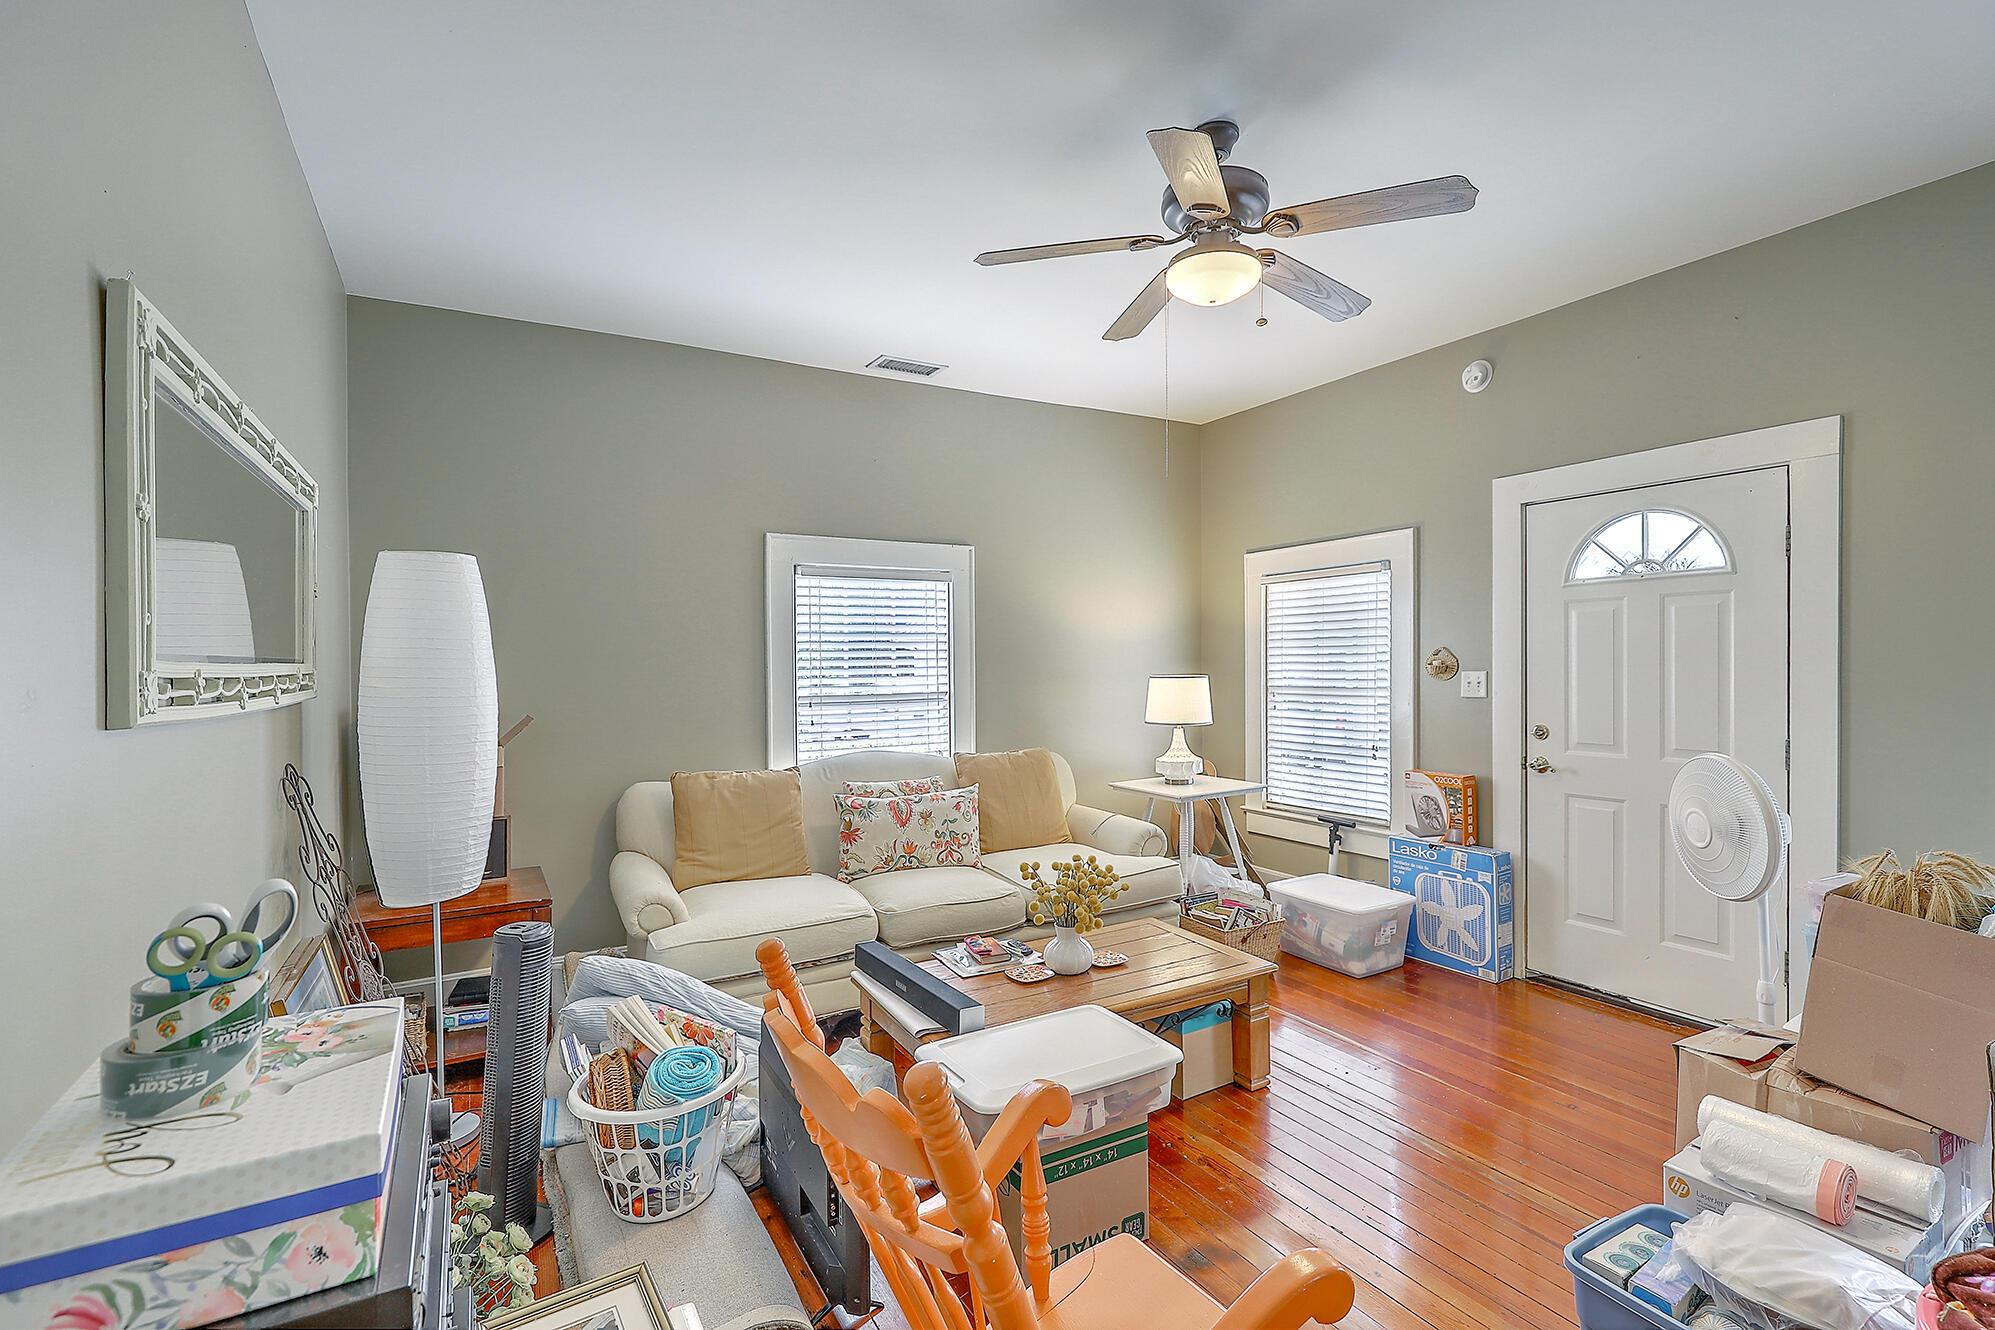 Summerville Homes For Sale - 102 Hickory, Summerville, SC - 84